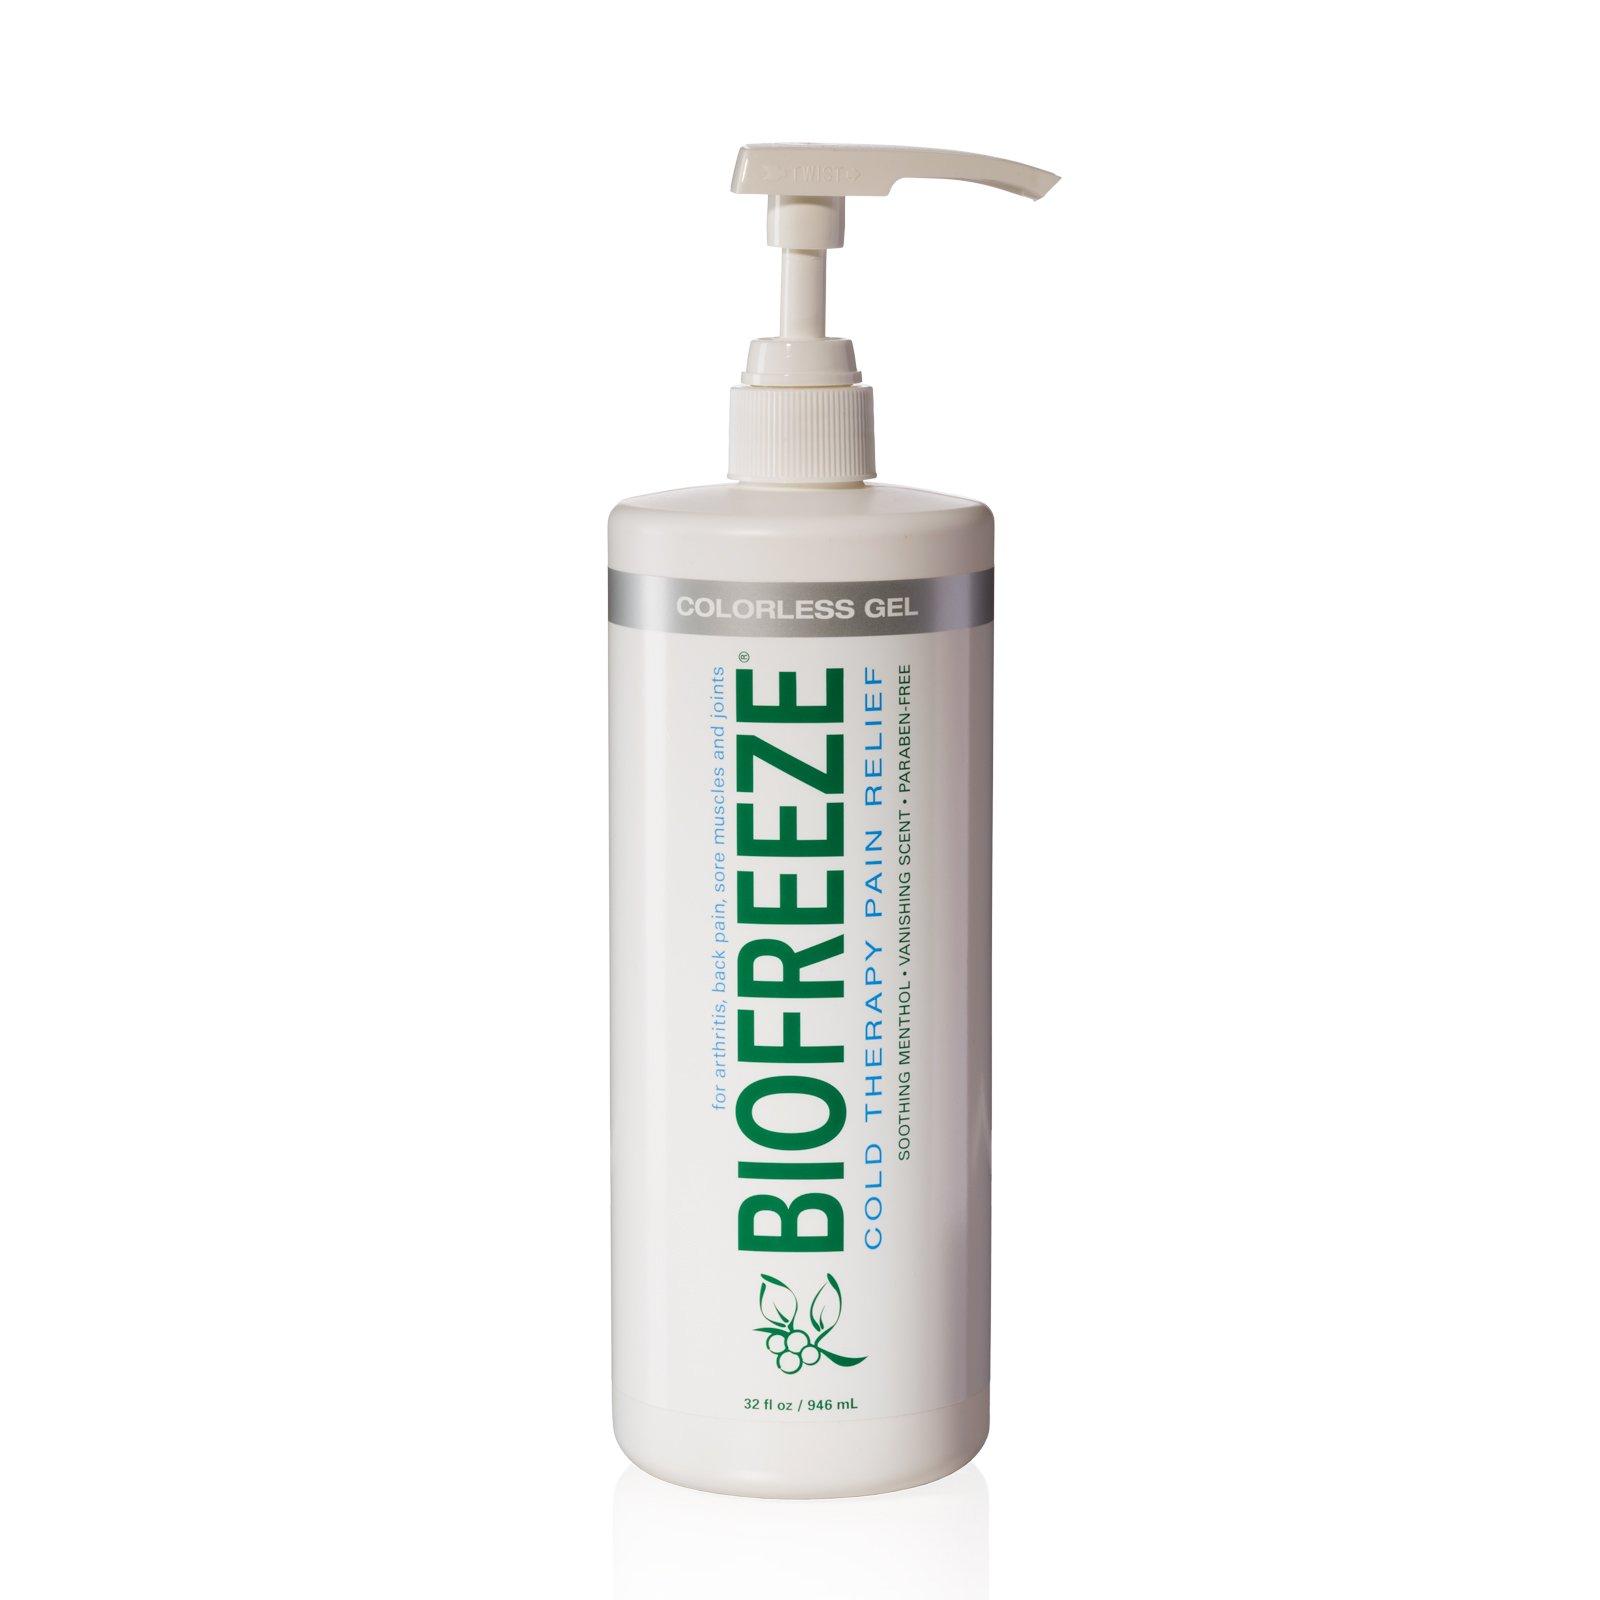 Biofreeze Pain Relief Gel, 32 oz. Pump, Colorless by Biofreeze